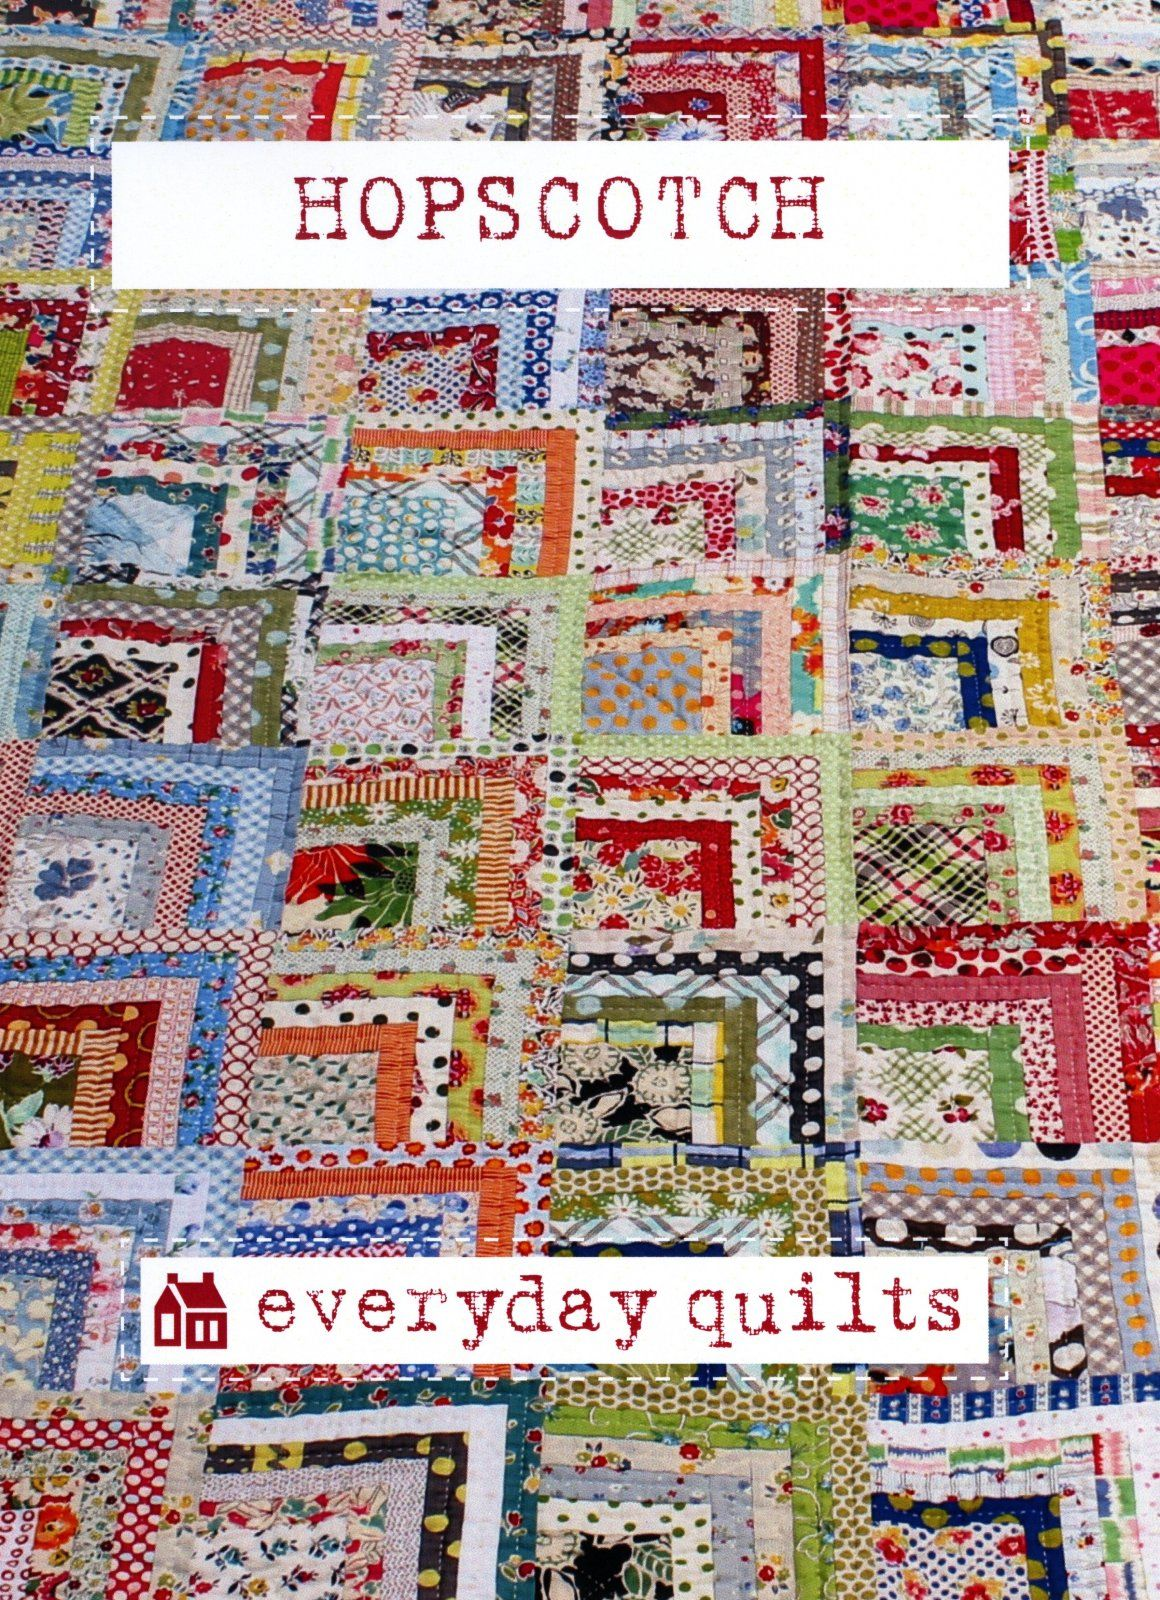 Hopscotch - Everyday Quilts - Sandra Boyle   Quilts We Love ... : hopscotch quilt pattern - Adamdwight.com